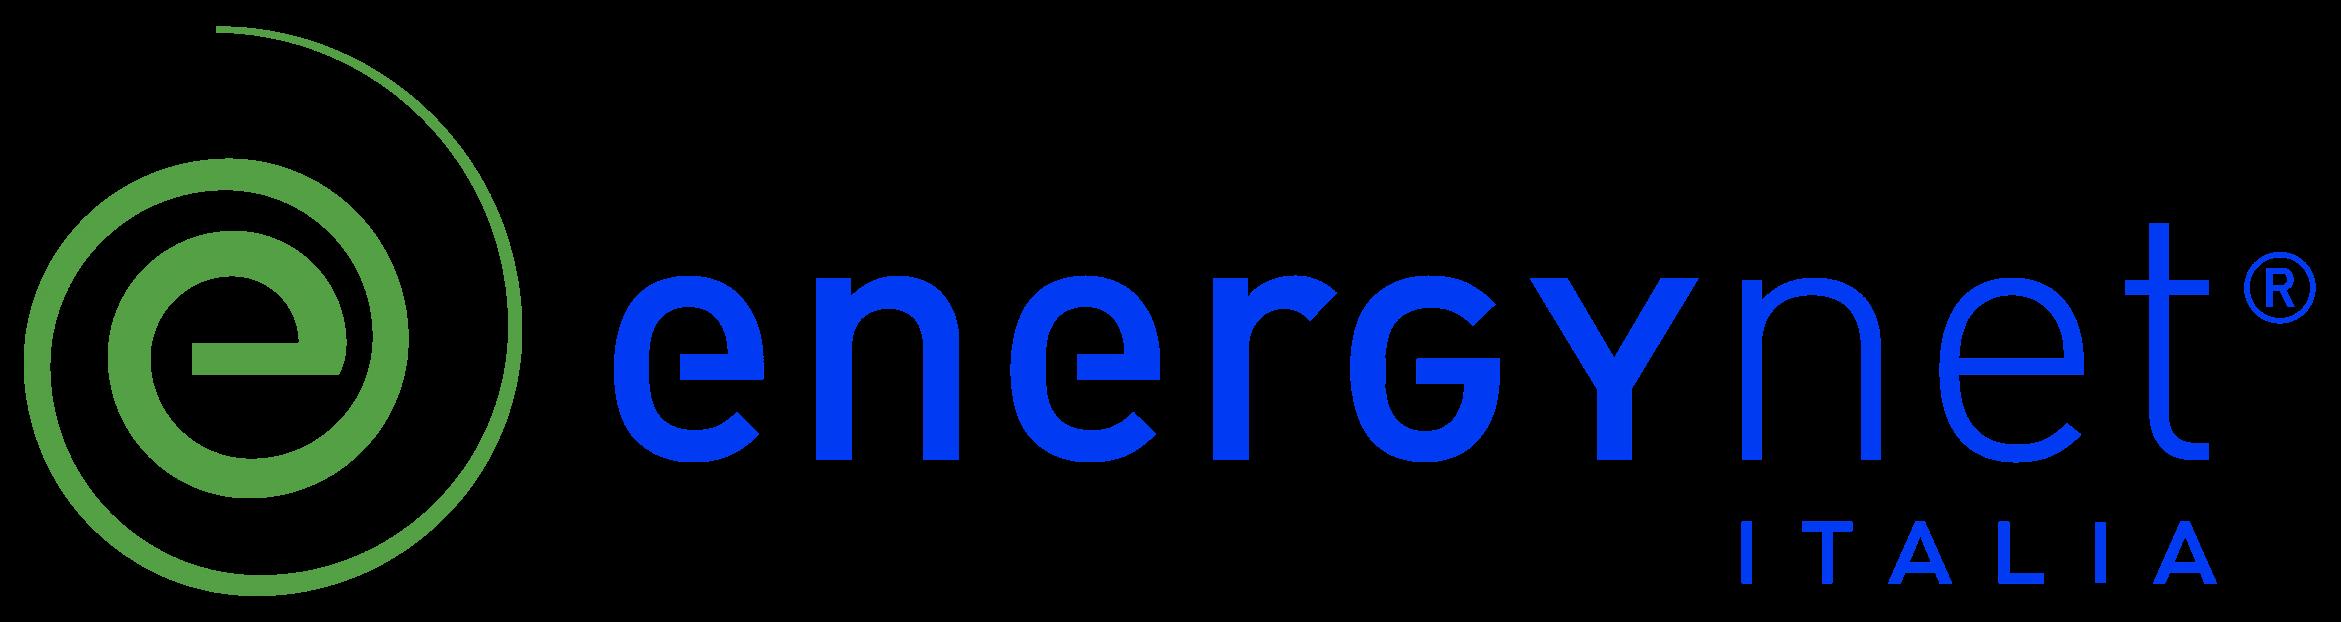 logo_energy_net_italia.png